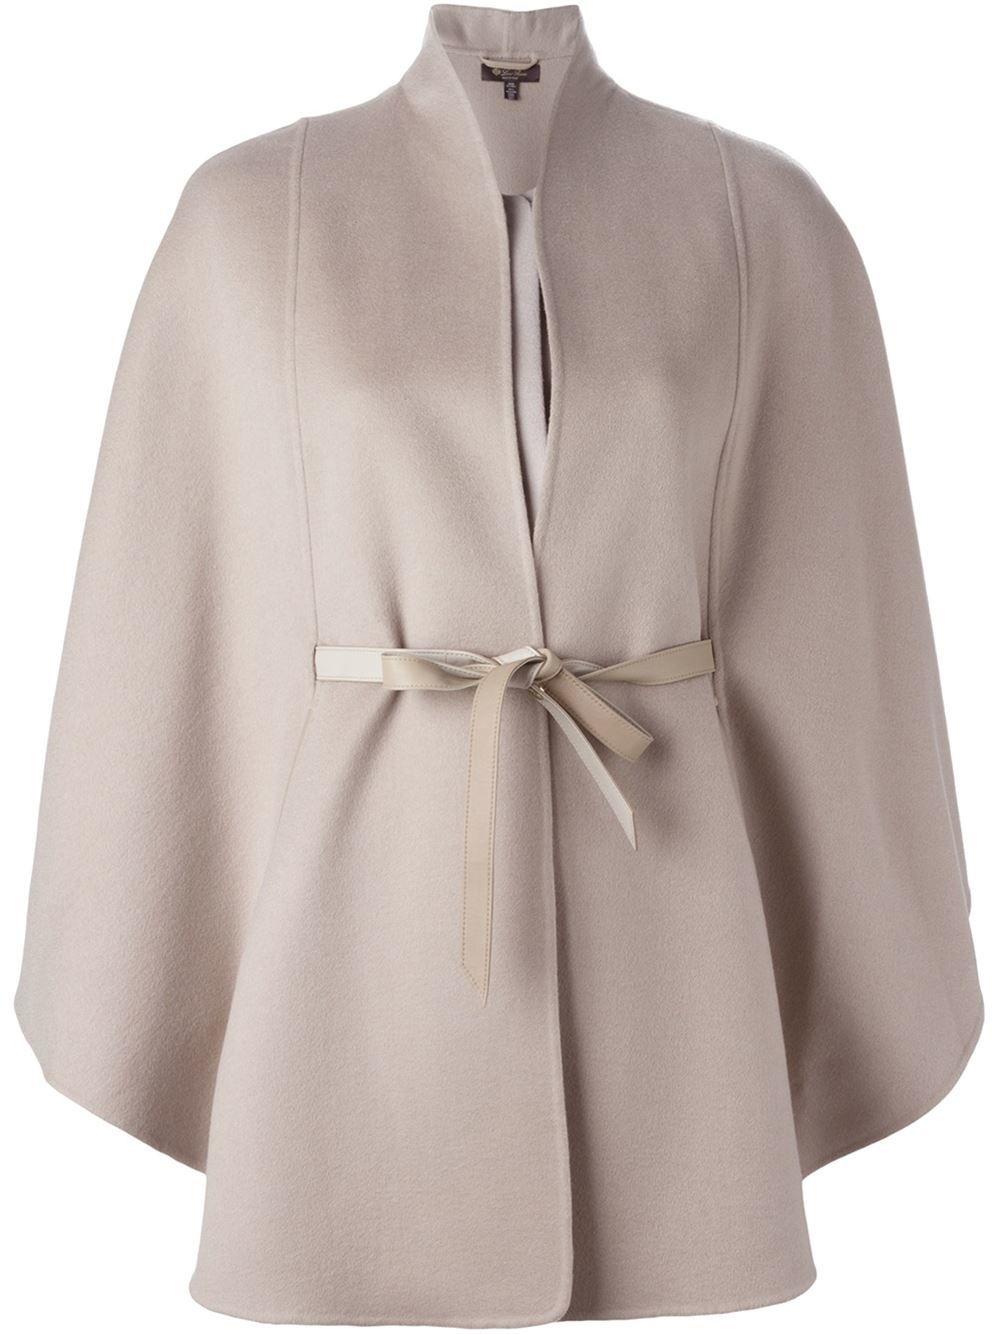 https://cdnc.lystit.com/photos/bc55-2015/07/27/loro-piana-nude-neutrals-belted-cape-coat-beige-product-4-611171550-normal.jpeg